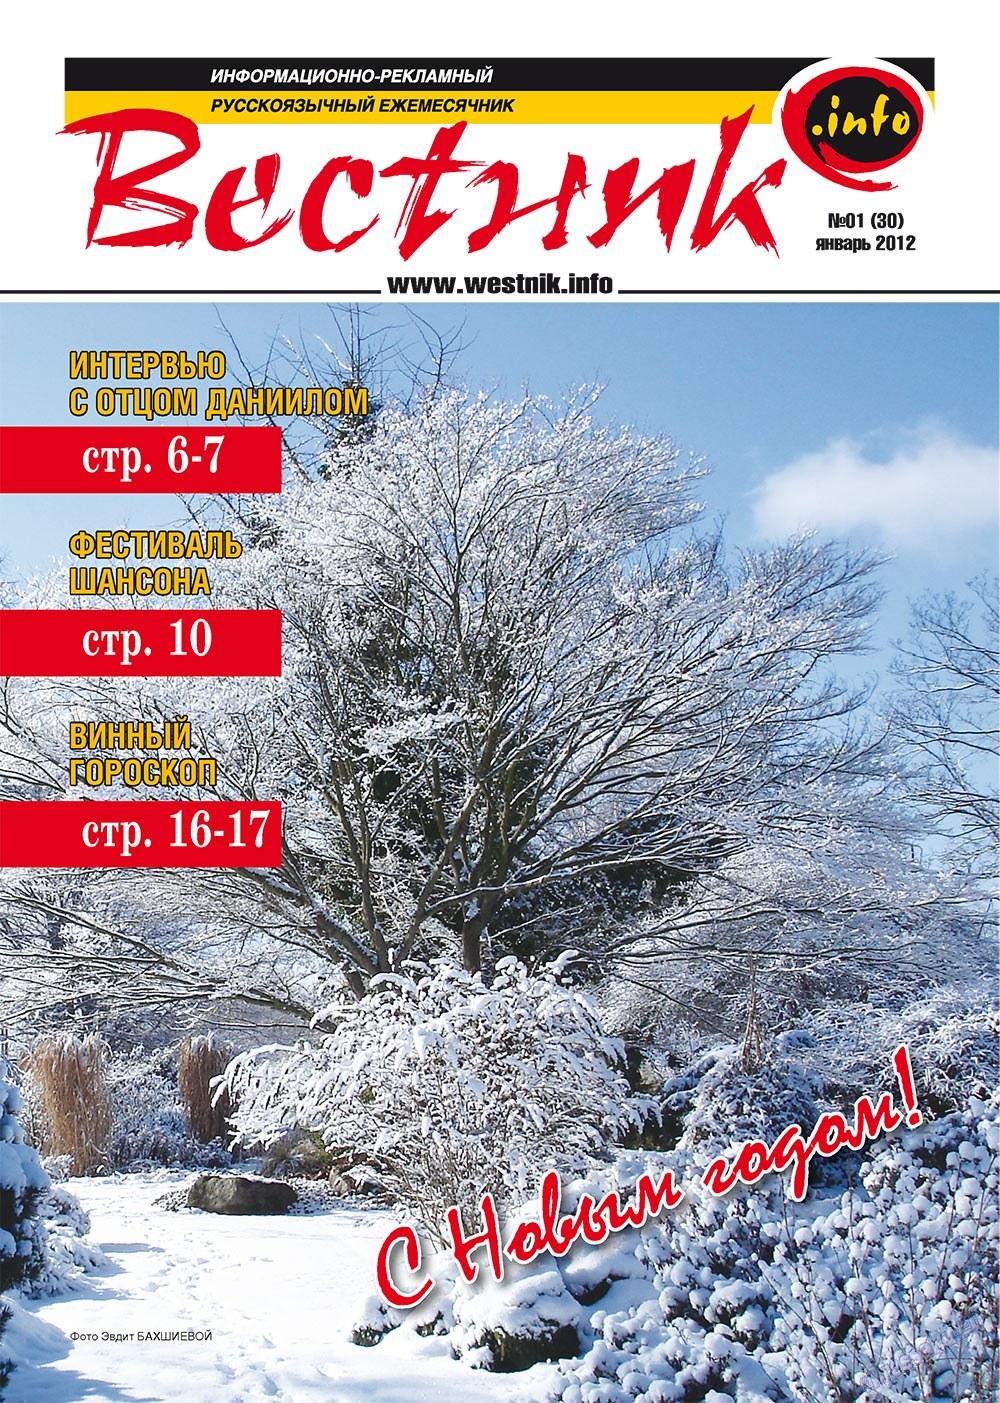 Вестник-info (журнал). 2012 год, номер 1, стр. 1